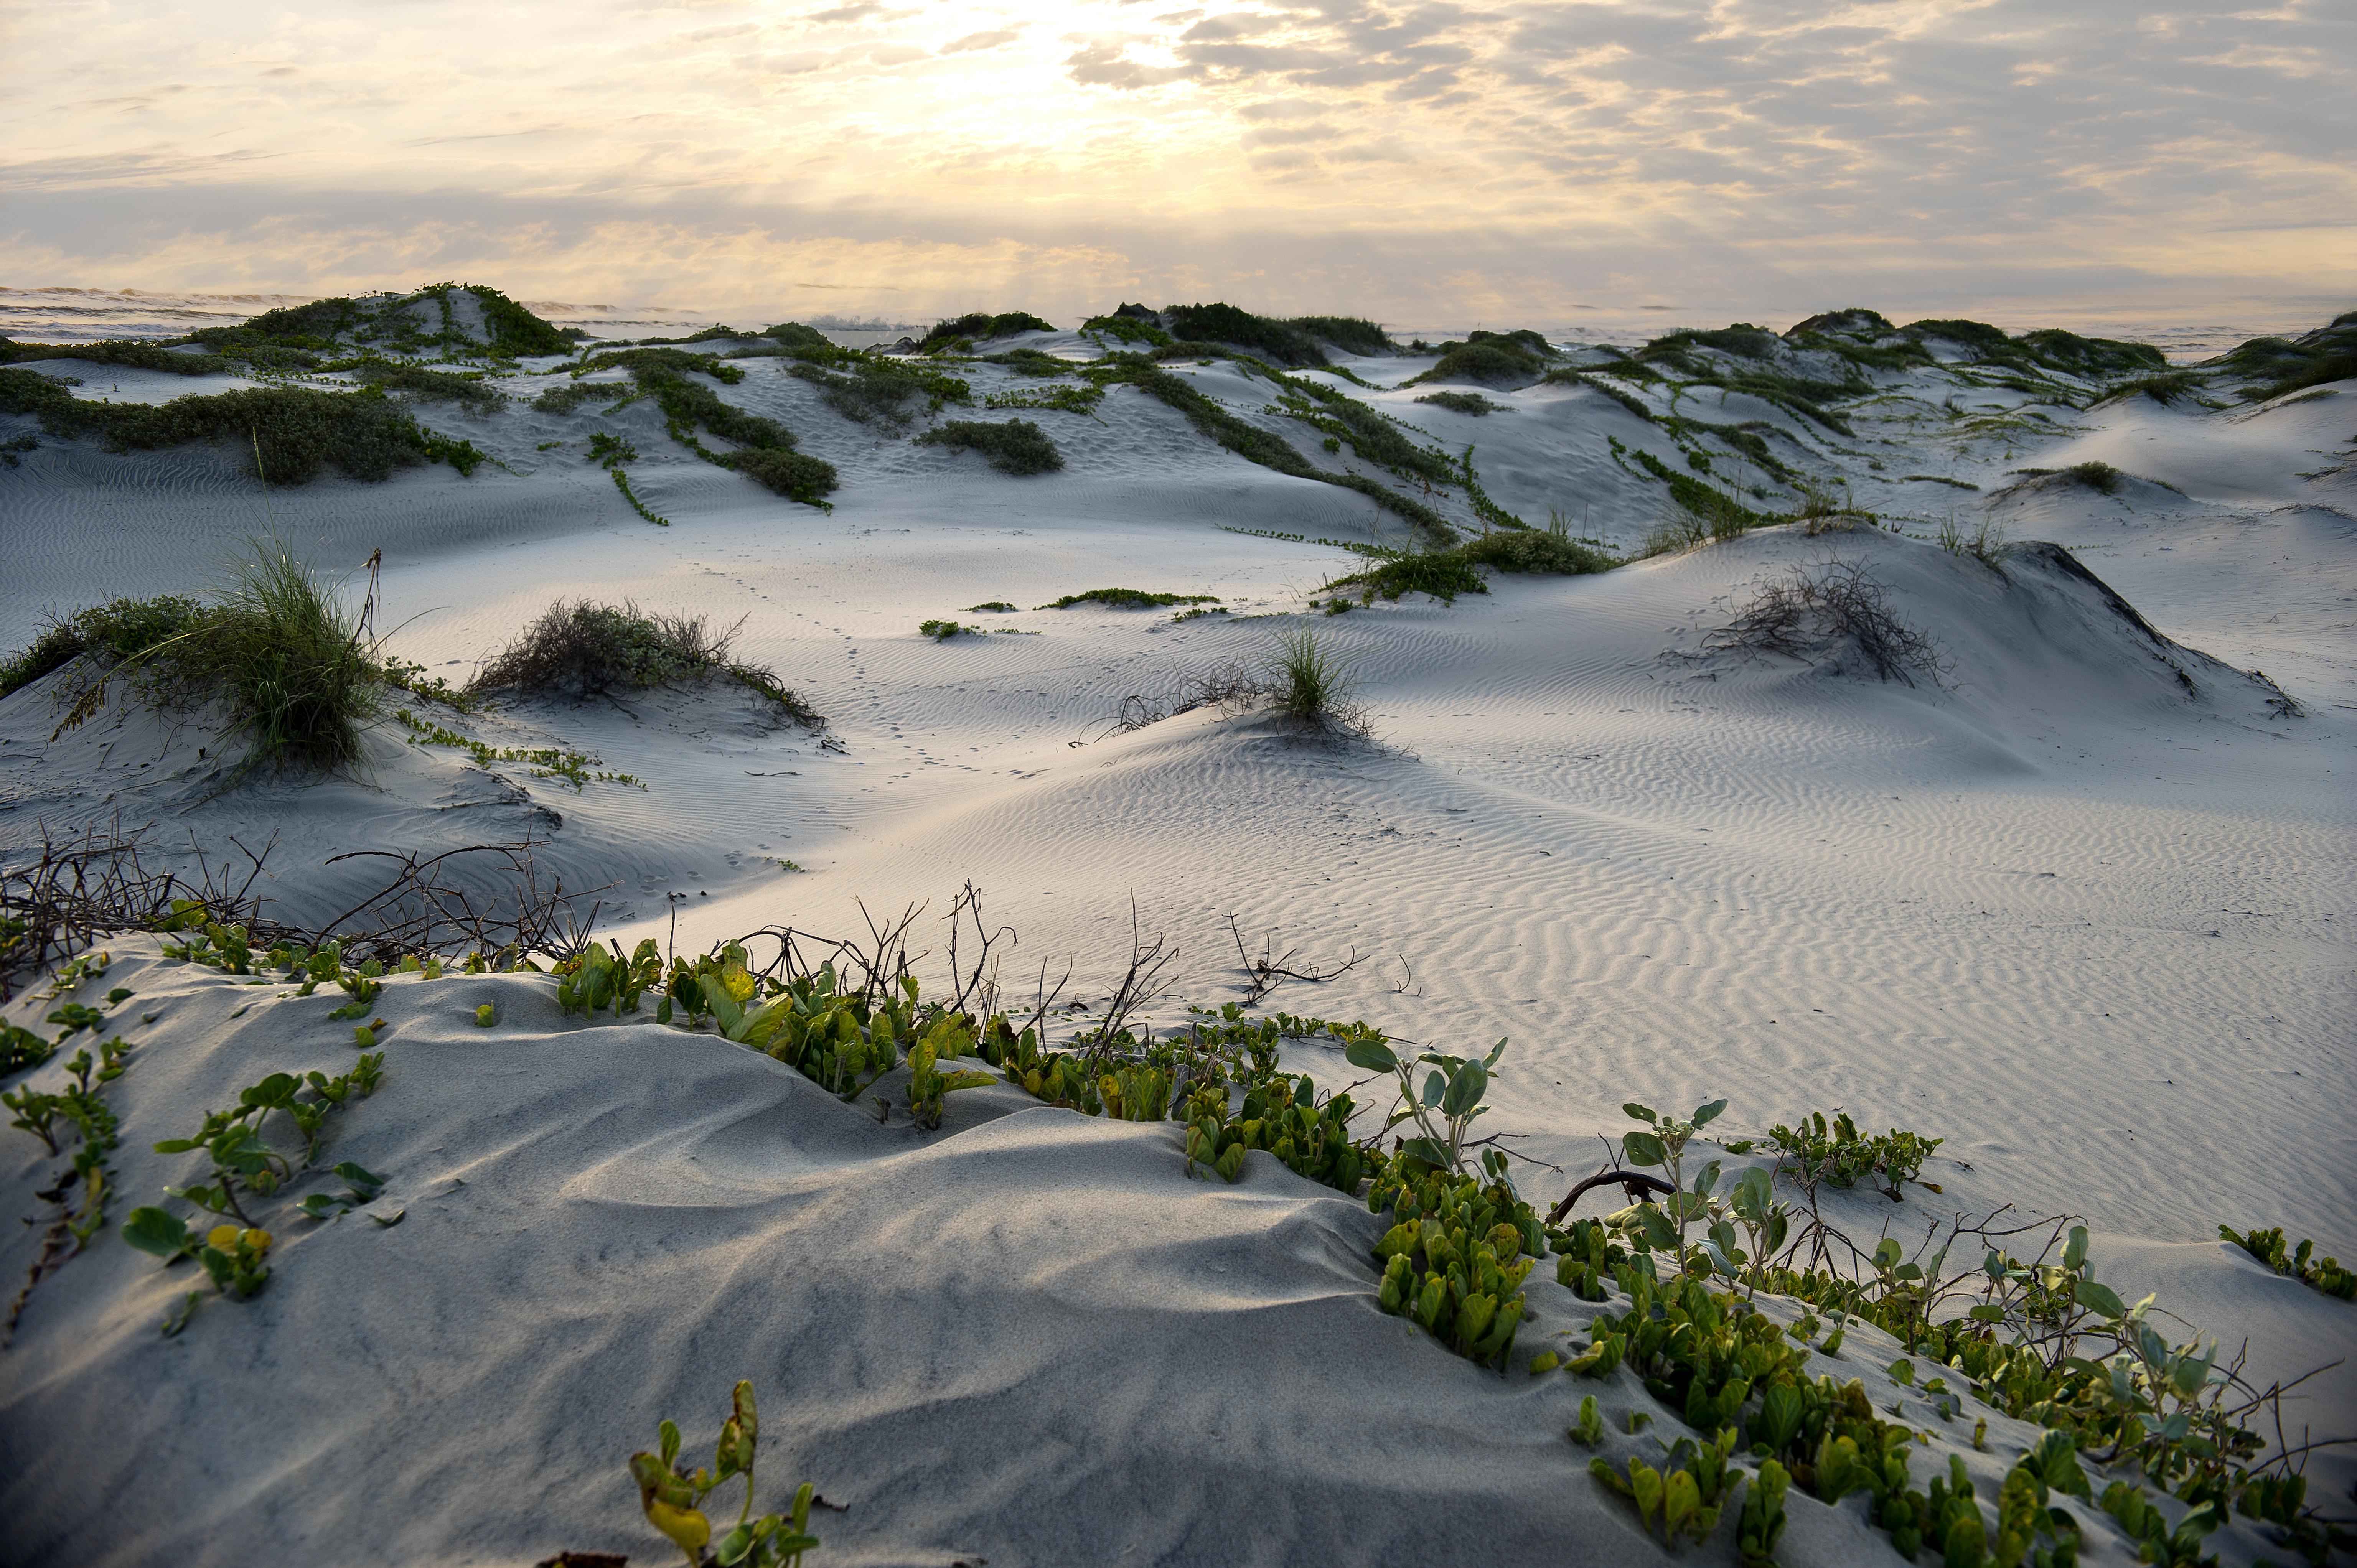 Texas dunes